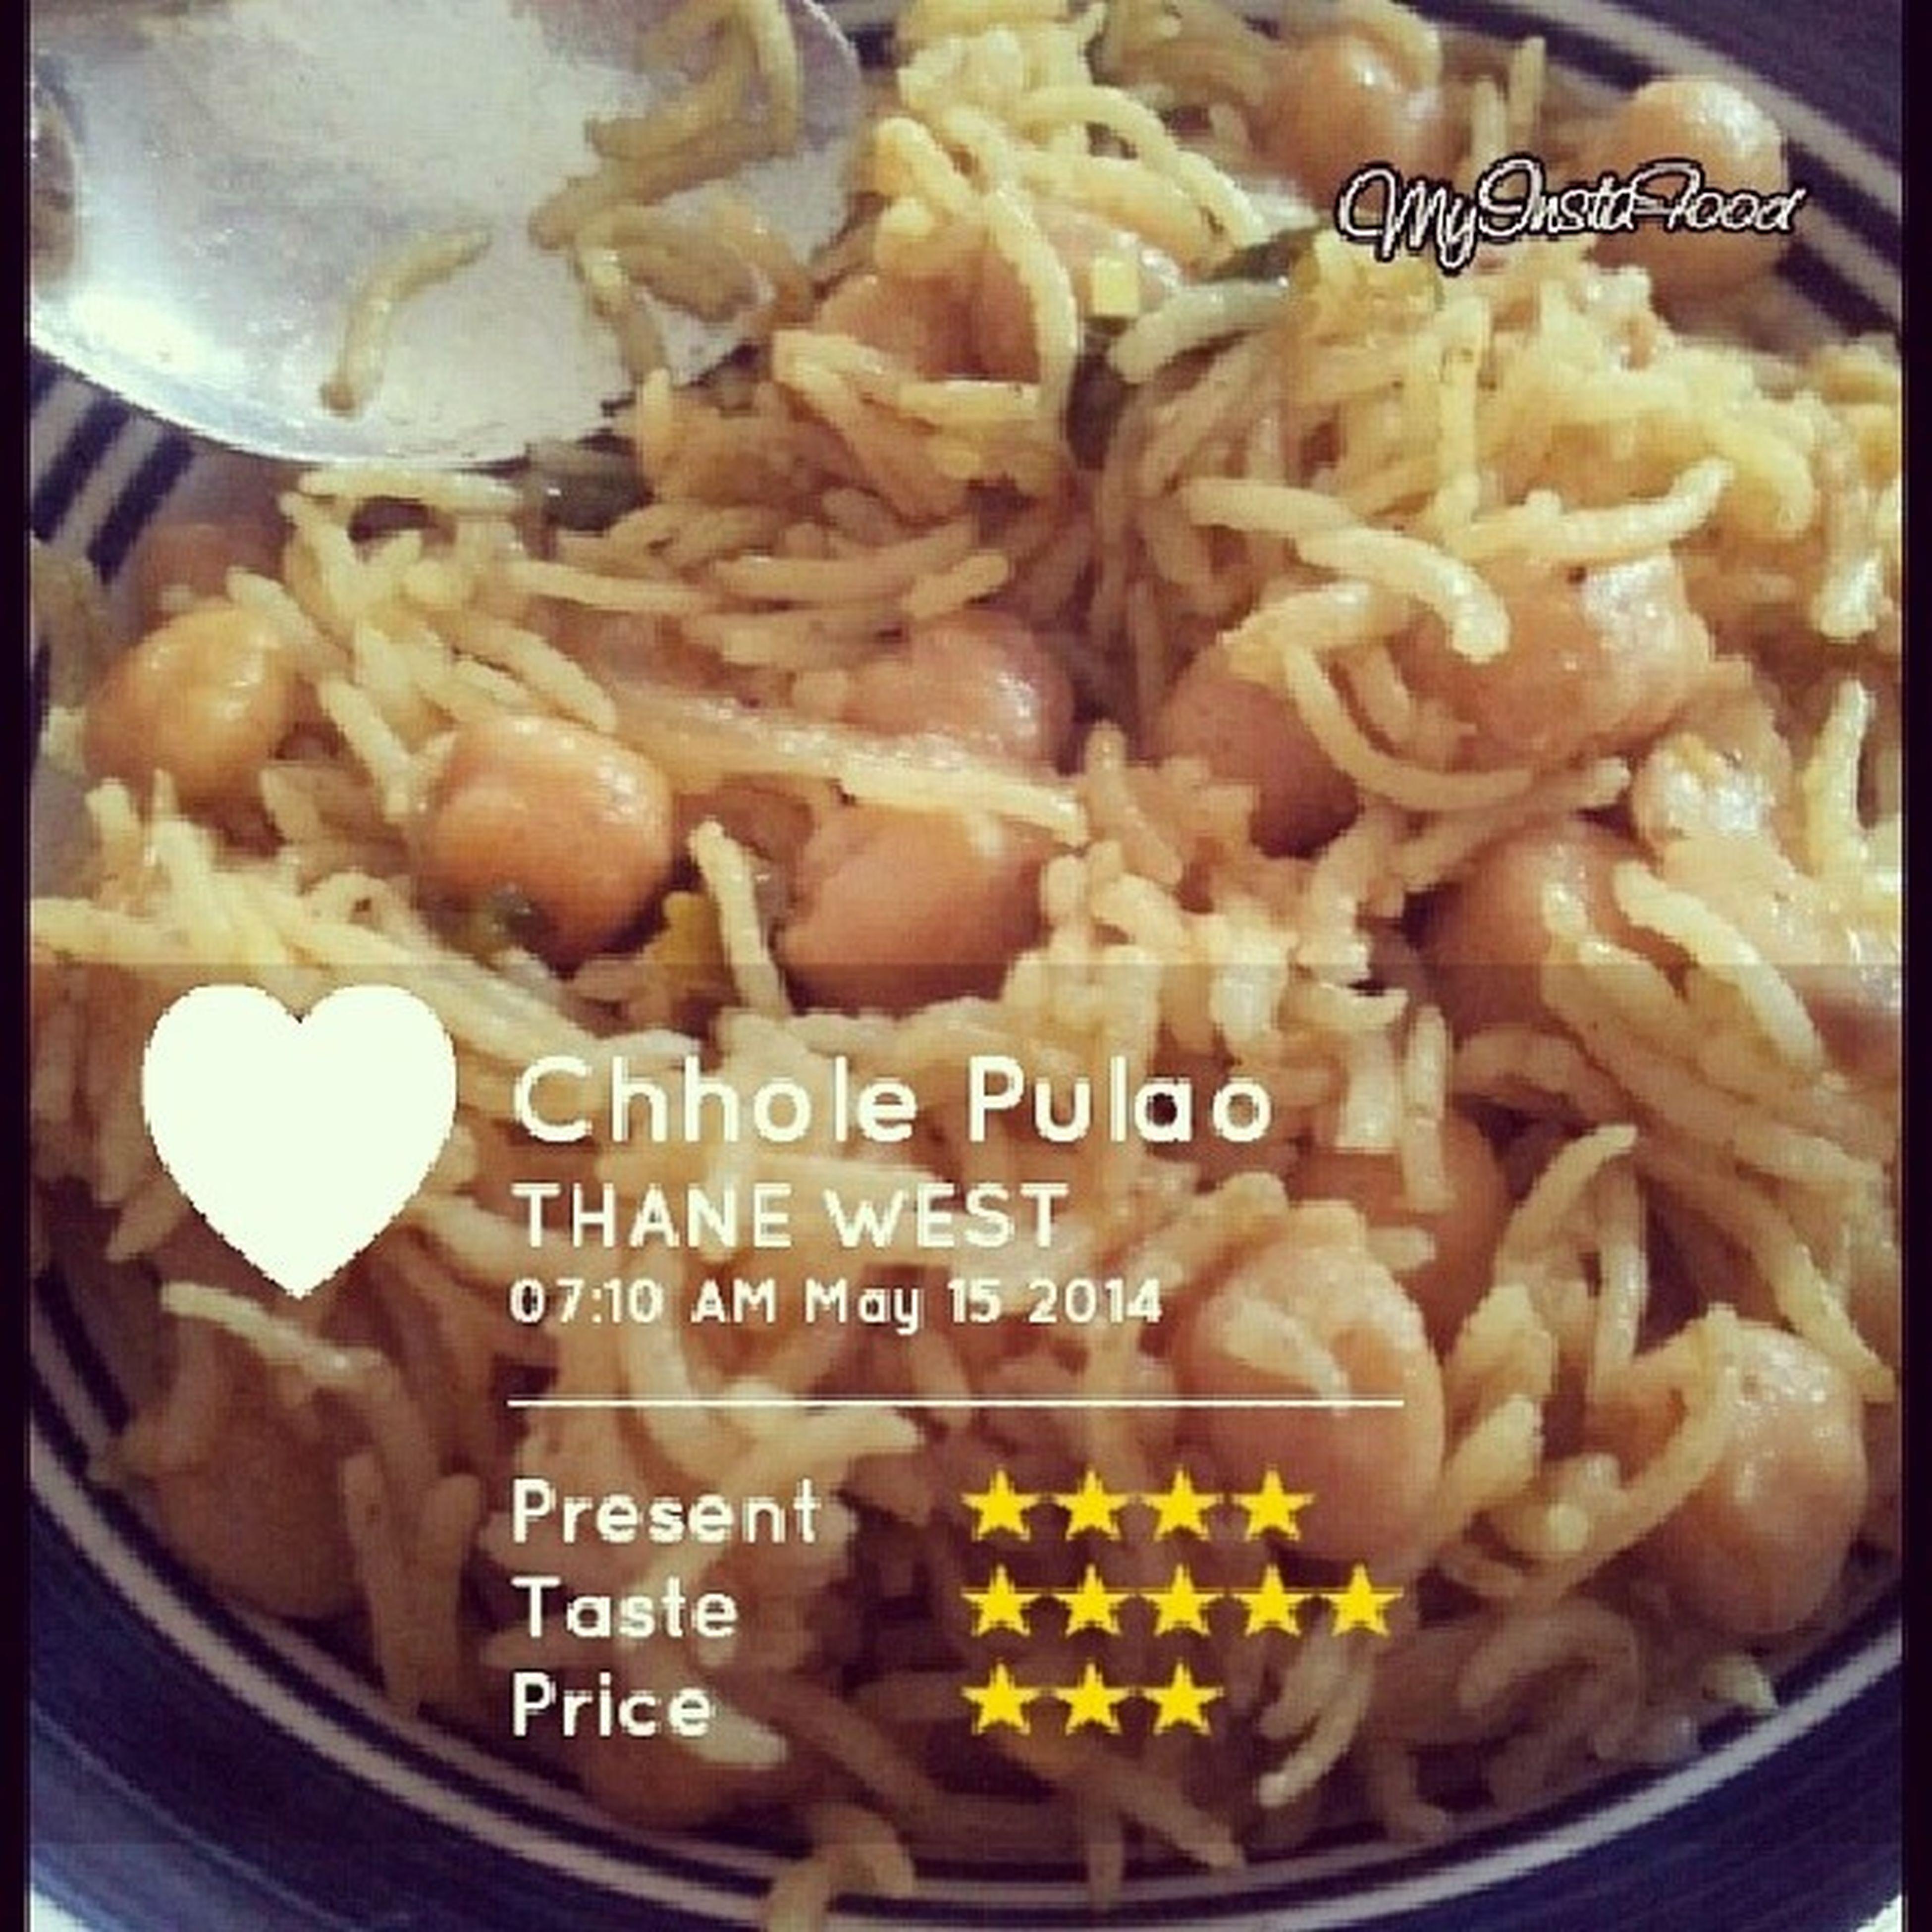 Chhole Pulao Recipee Thane Mumbai Foodpic Foodie Myinstafood Delicious GetInMyBelly Instafood Yum Yummy Food Photooftheday Picoftheday